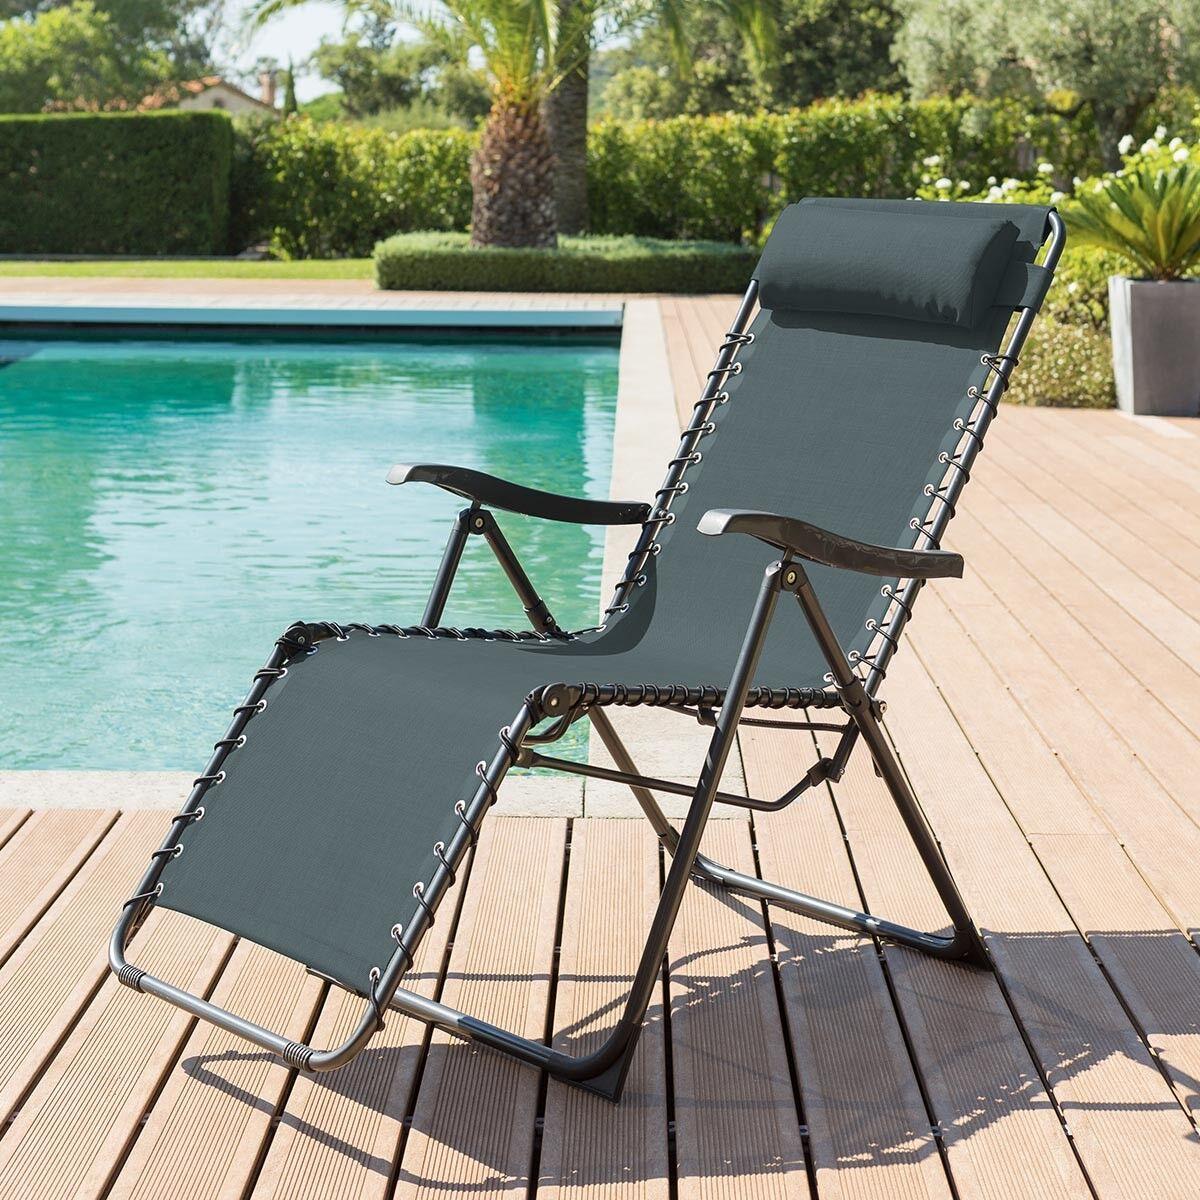 Hespéride Fauteuil relax de jardin Silos Bleu canard 5 positions - Acier traité époxy, Texaline